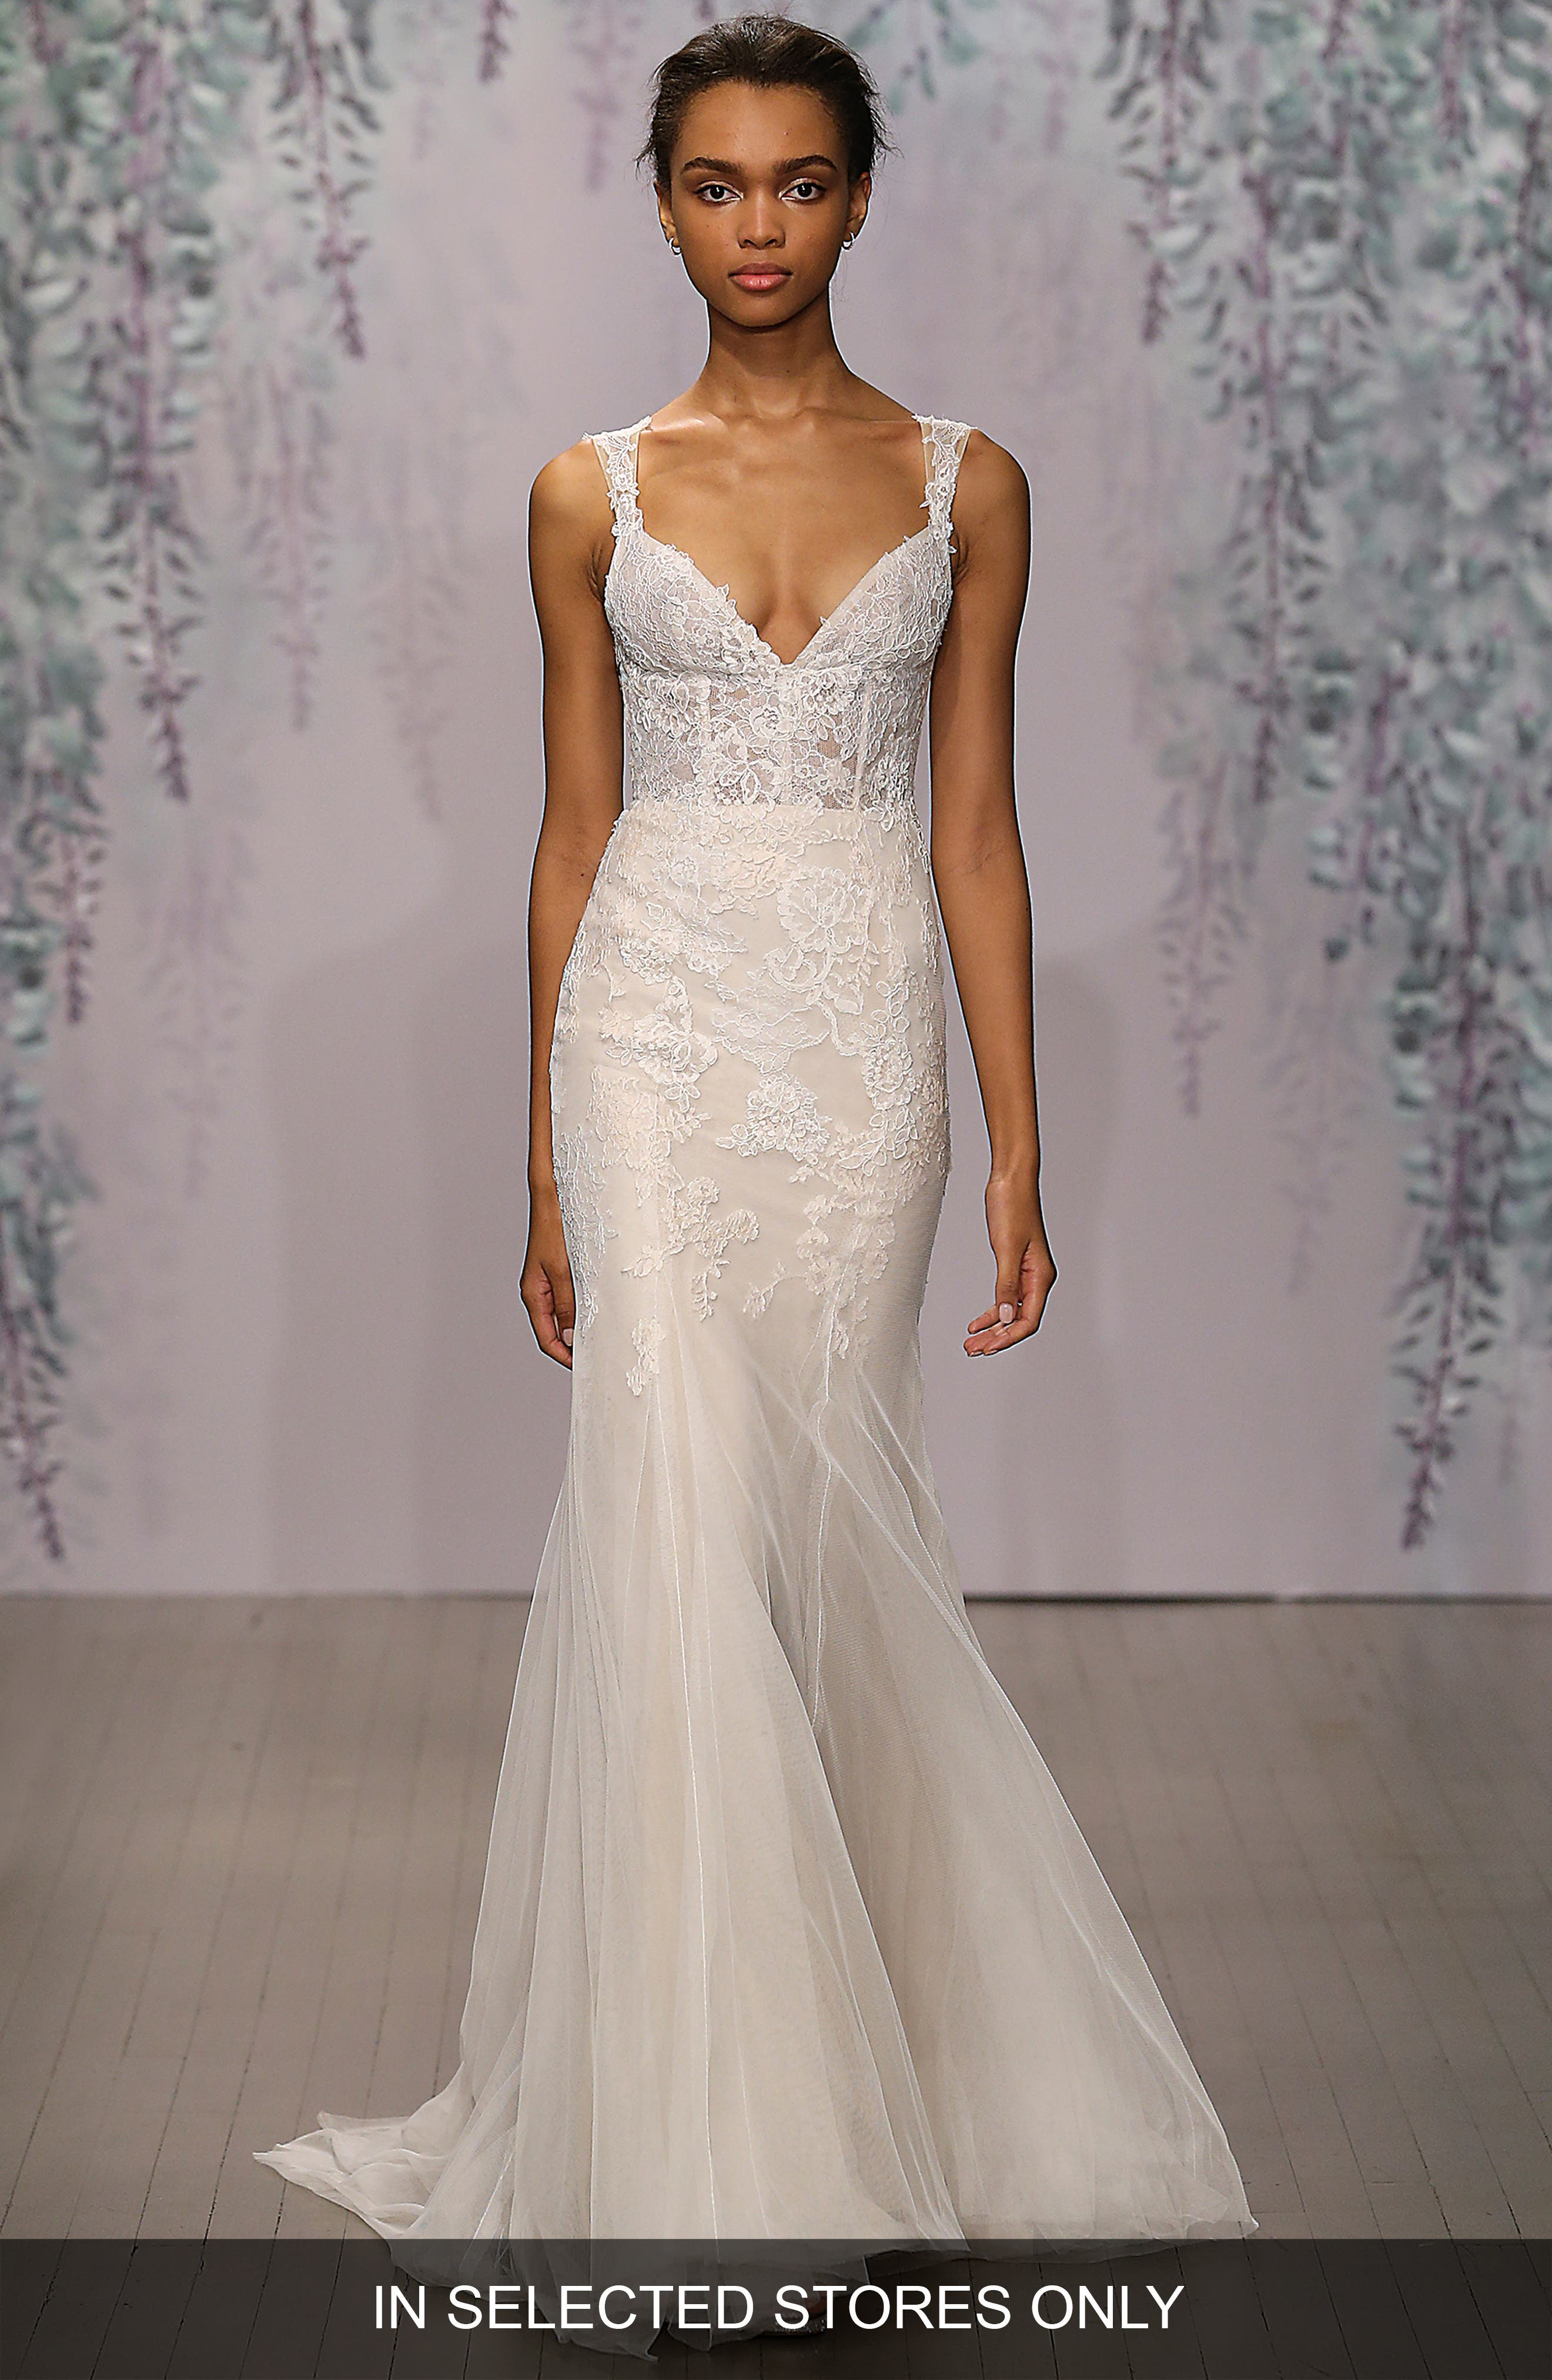 Dulce V-Neck Lace Tulle Sheath Dress,                         Main,                         color, Silk White/ Sorbet